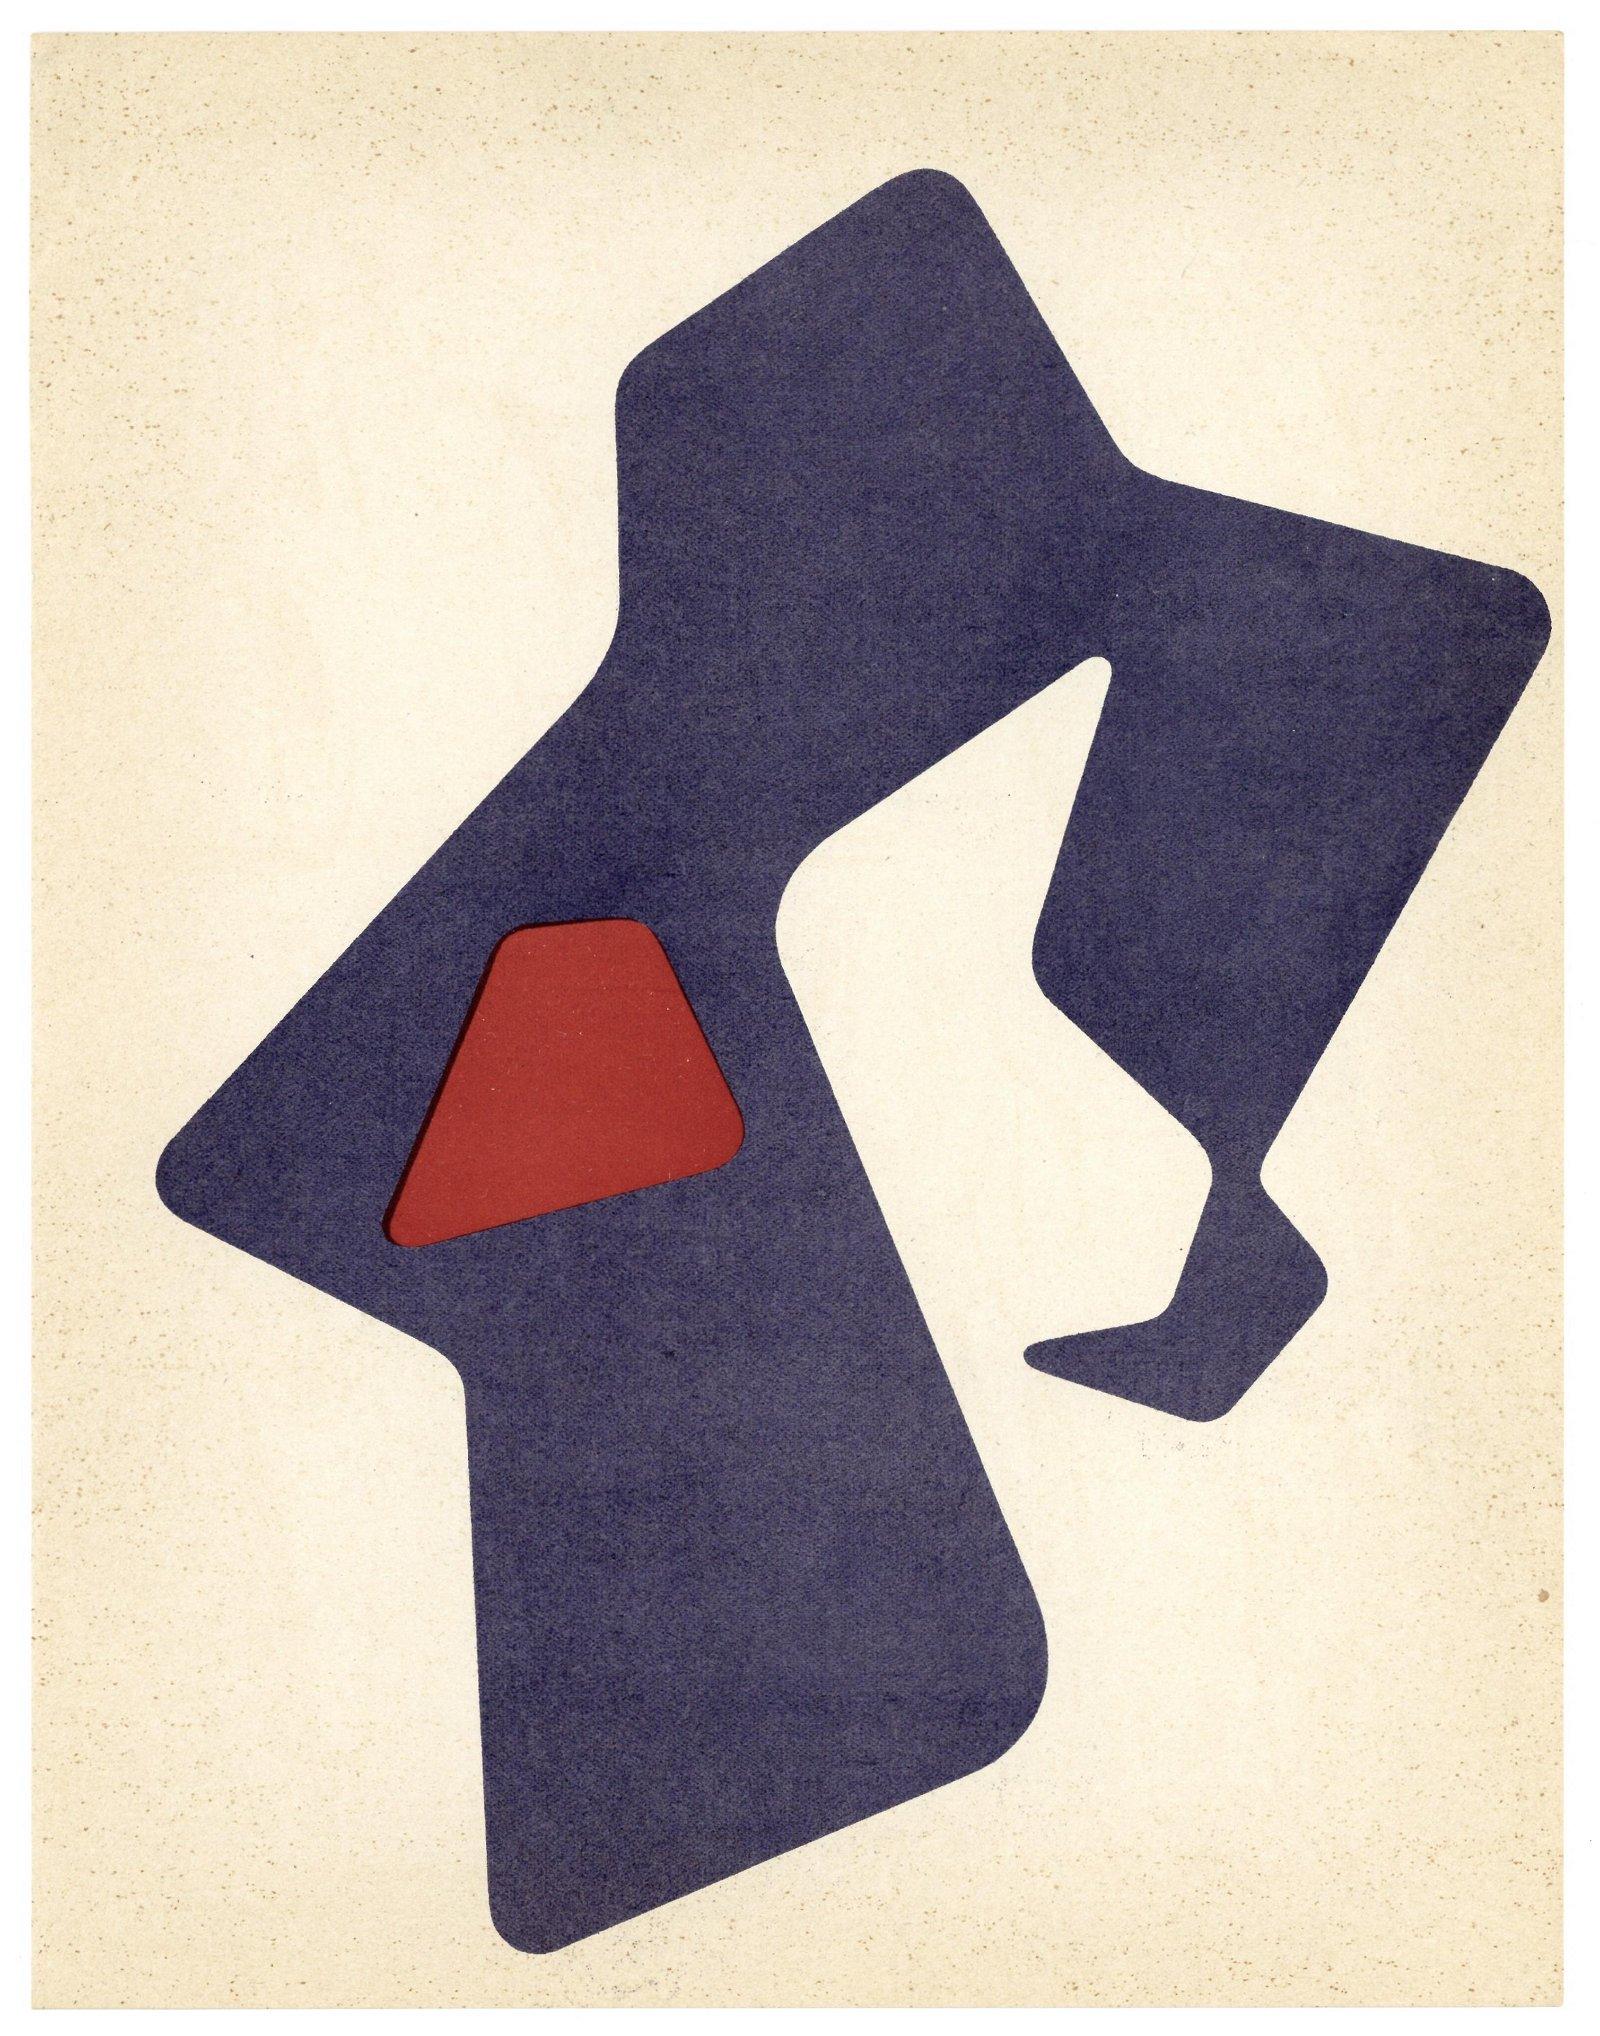 Jean Hans Arp original lithograph, 1951